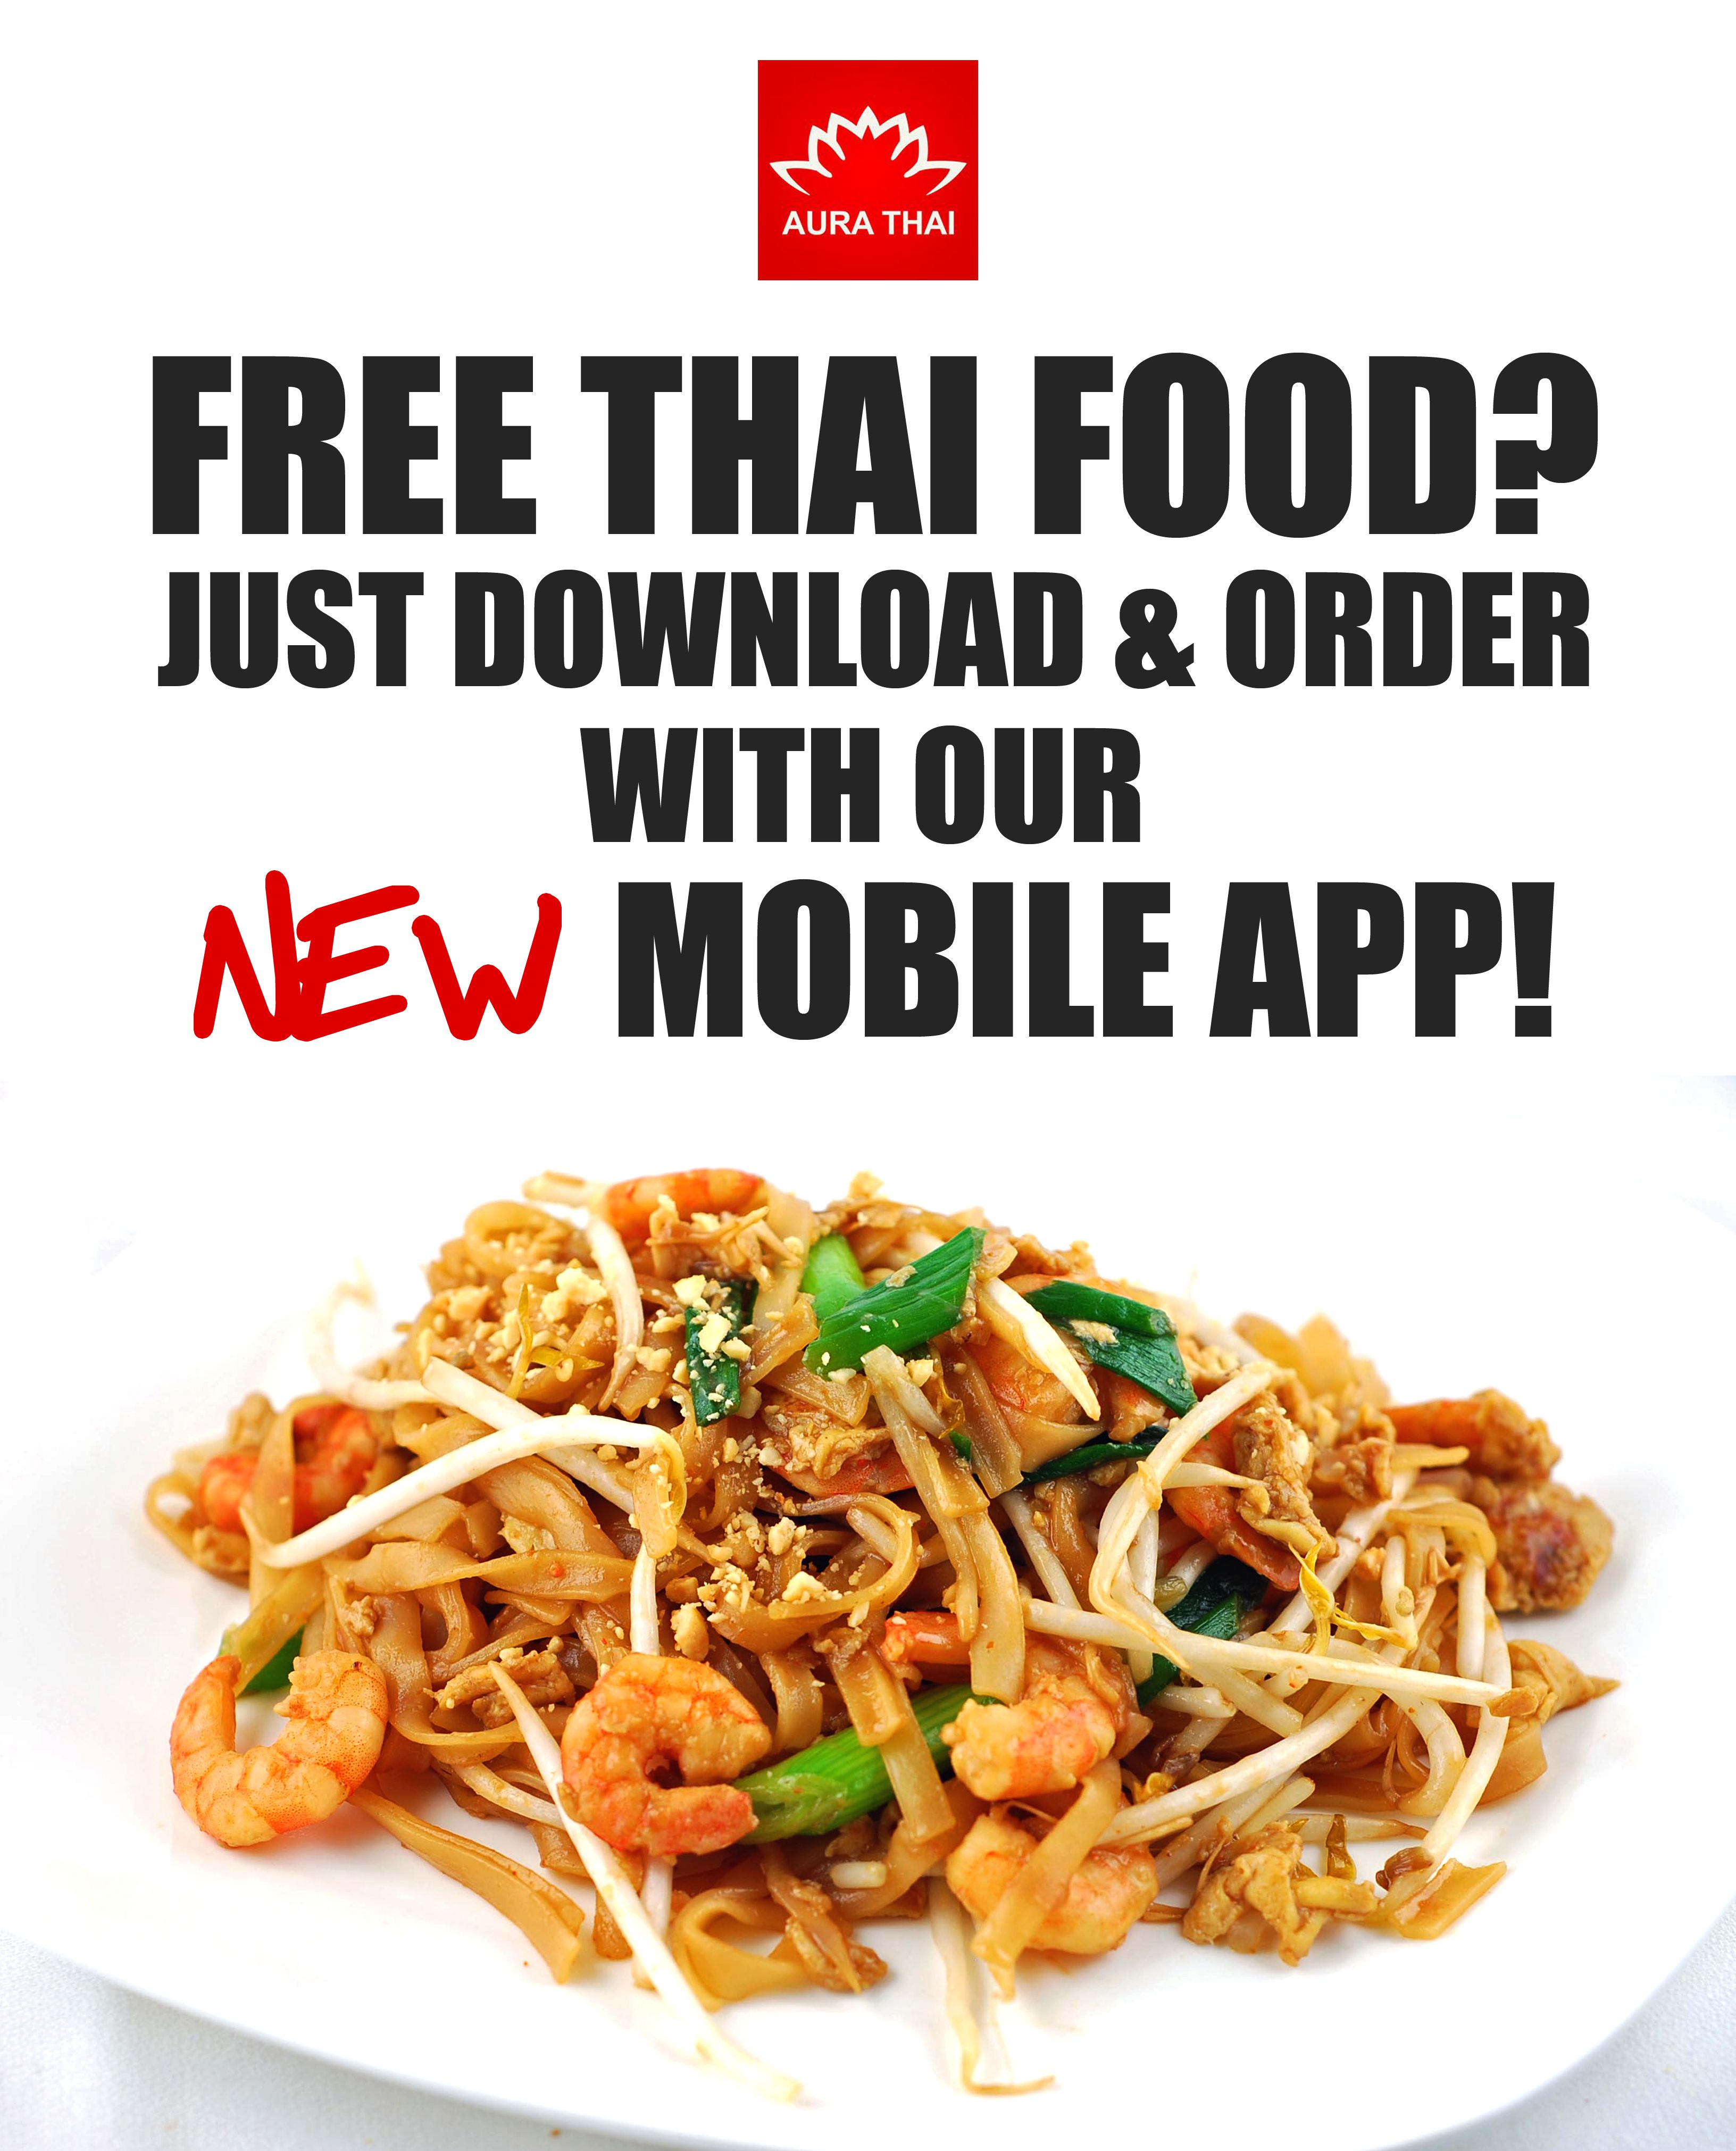 Claim Your Prize In 3 Steps 1 Download App 2 Order Online 3